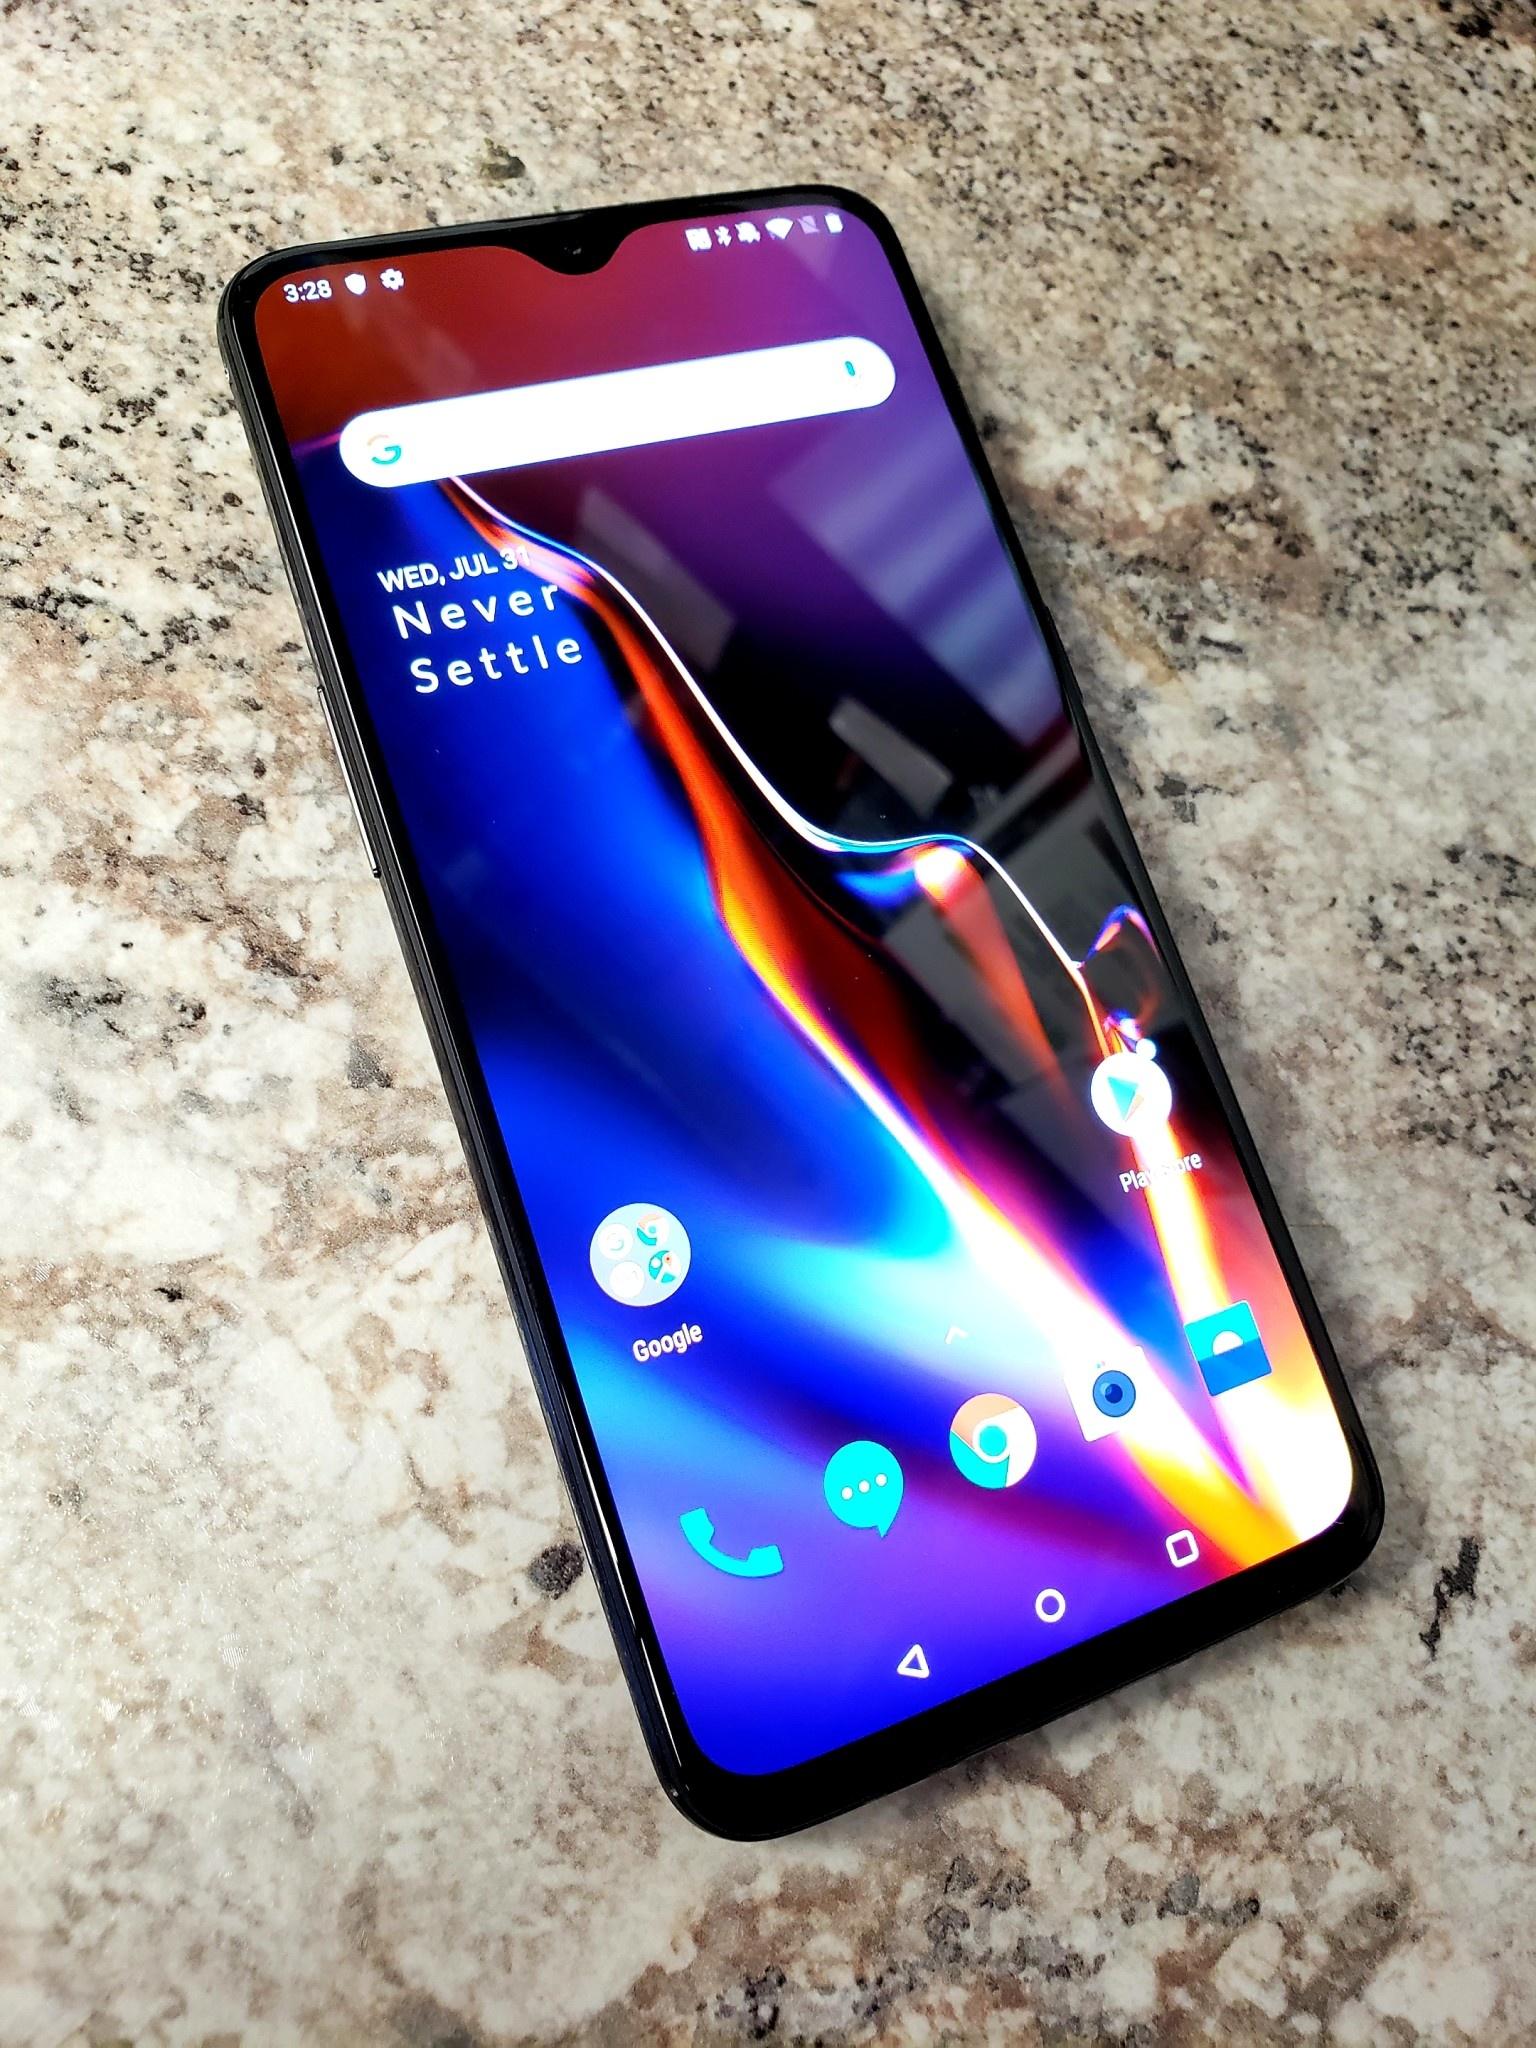 T-Mobile/MetroPCS - OnePlus 6T - 8GB RAM / 128GB - Black